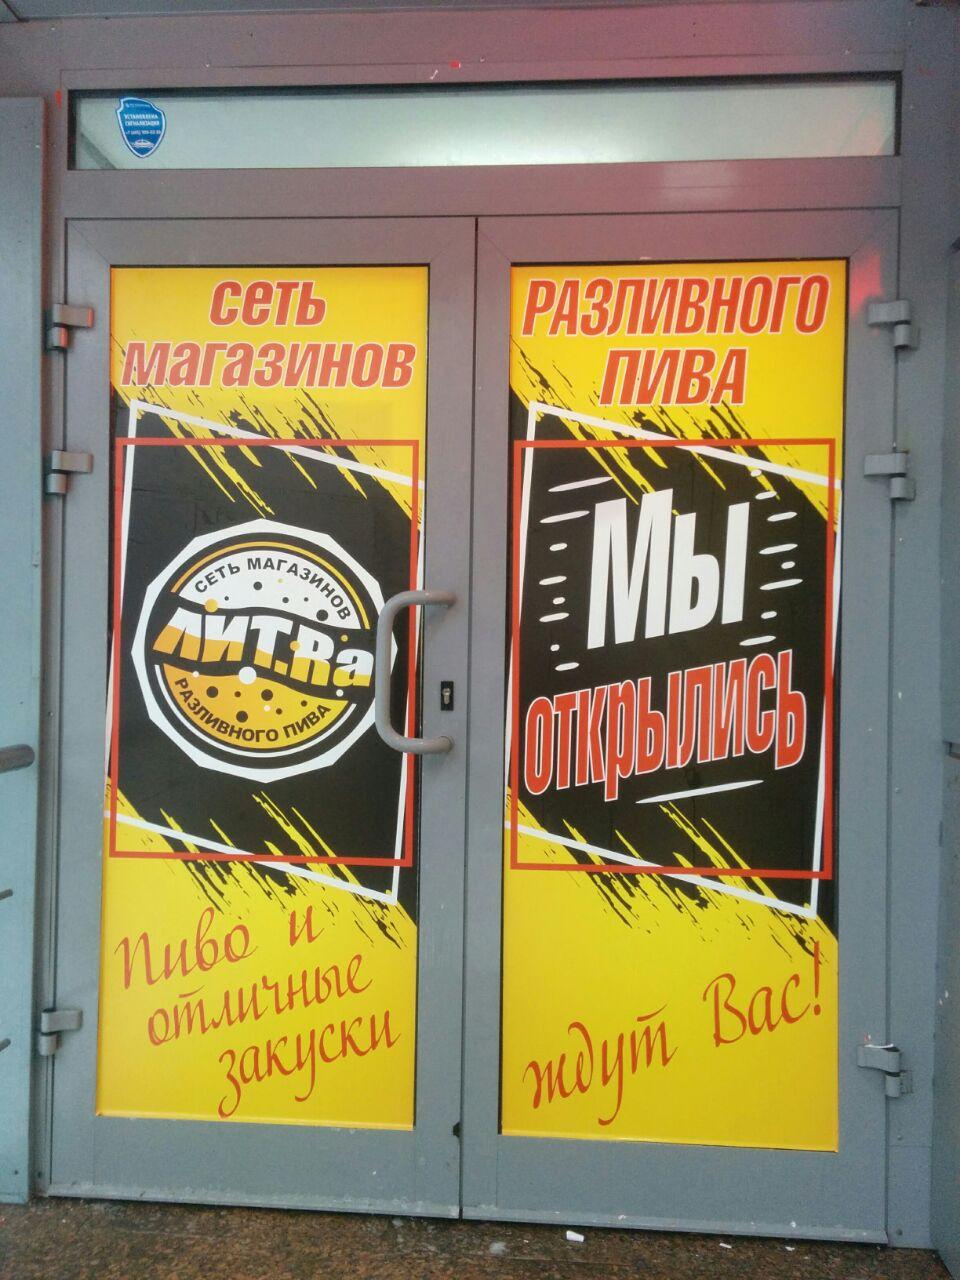 Плоттерная резка наклеек на двери пивного магазина